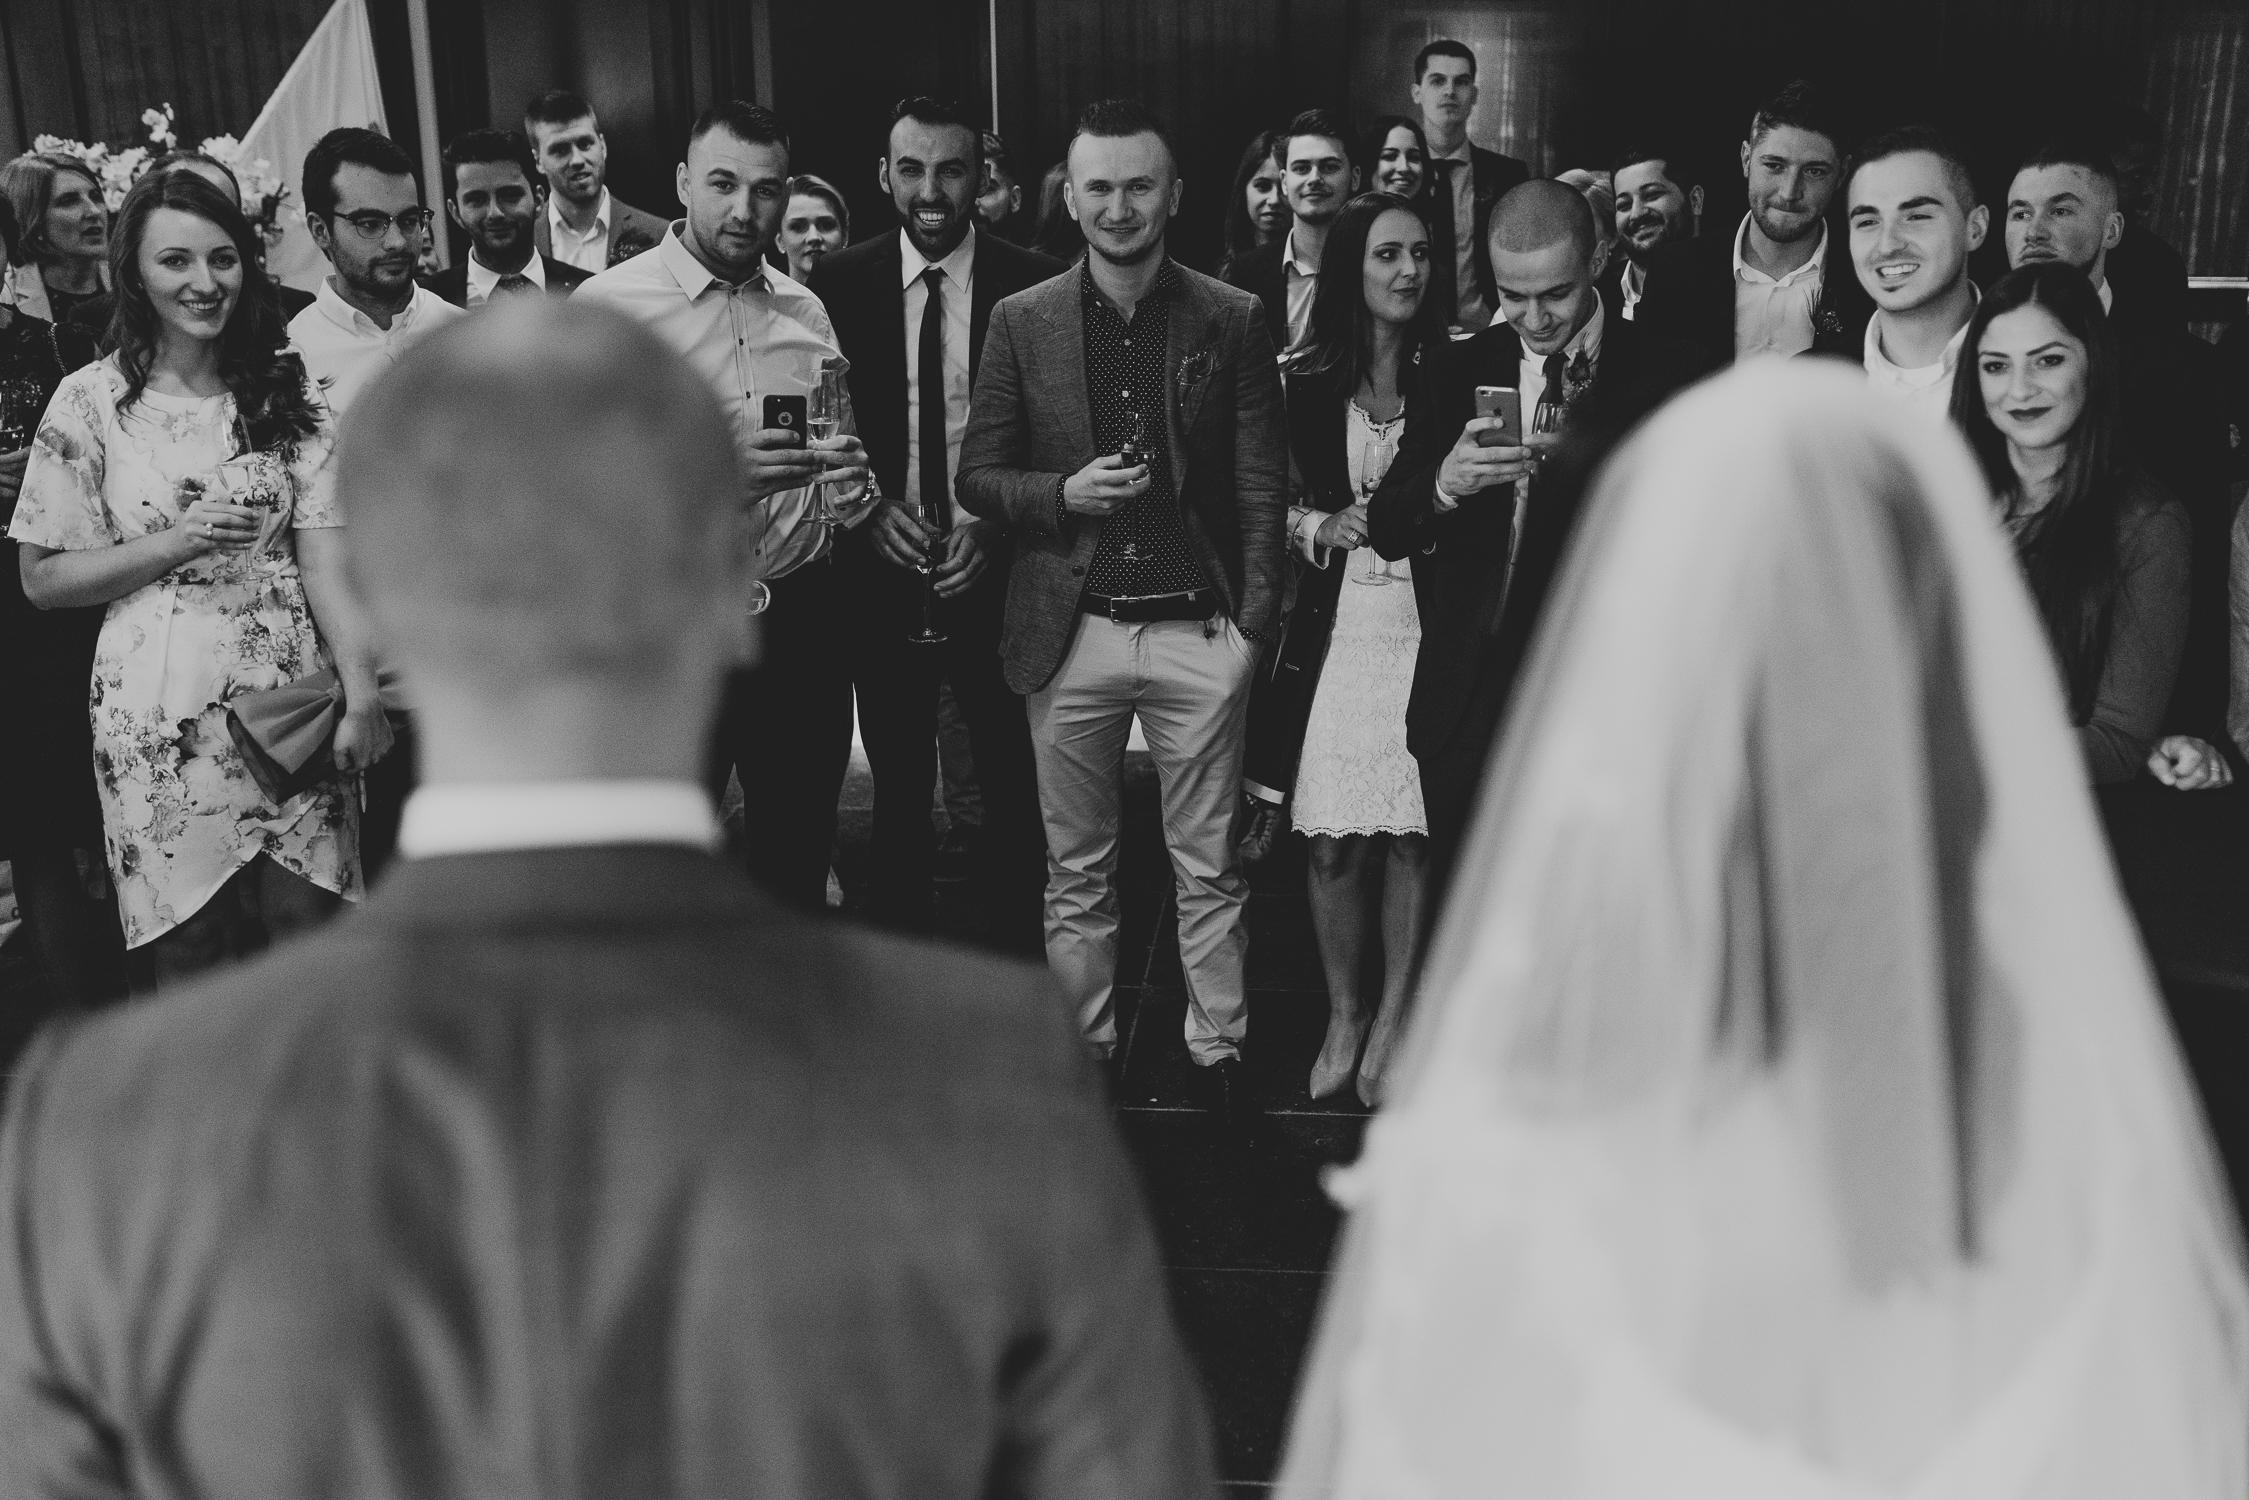 bruidsfotografie-bruidsfotograaf-mark-hadden-amsterdam-rotterdam-utrecht-wedding-photographer-Dado-Delila-183-2.jpg